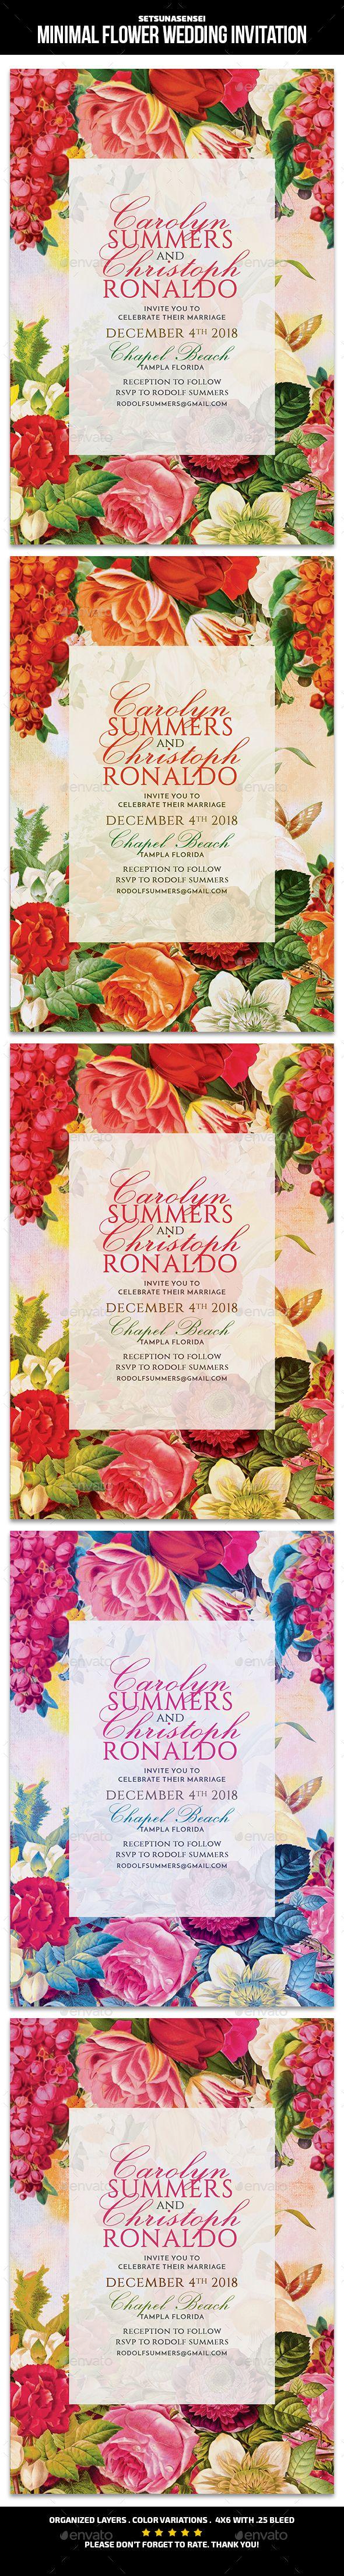 Wedding decorations beach december 2018 Minimal Flower Wedding Invitation  Invitations Cards u Invites